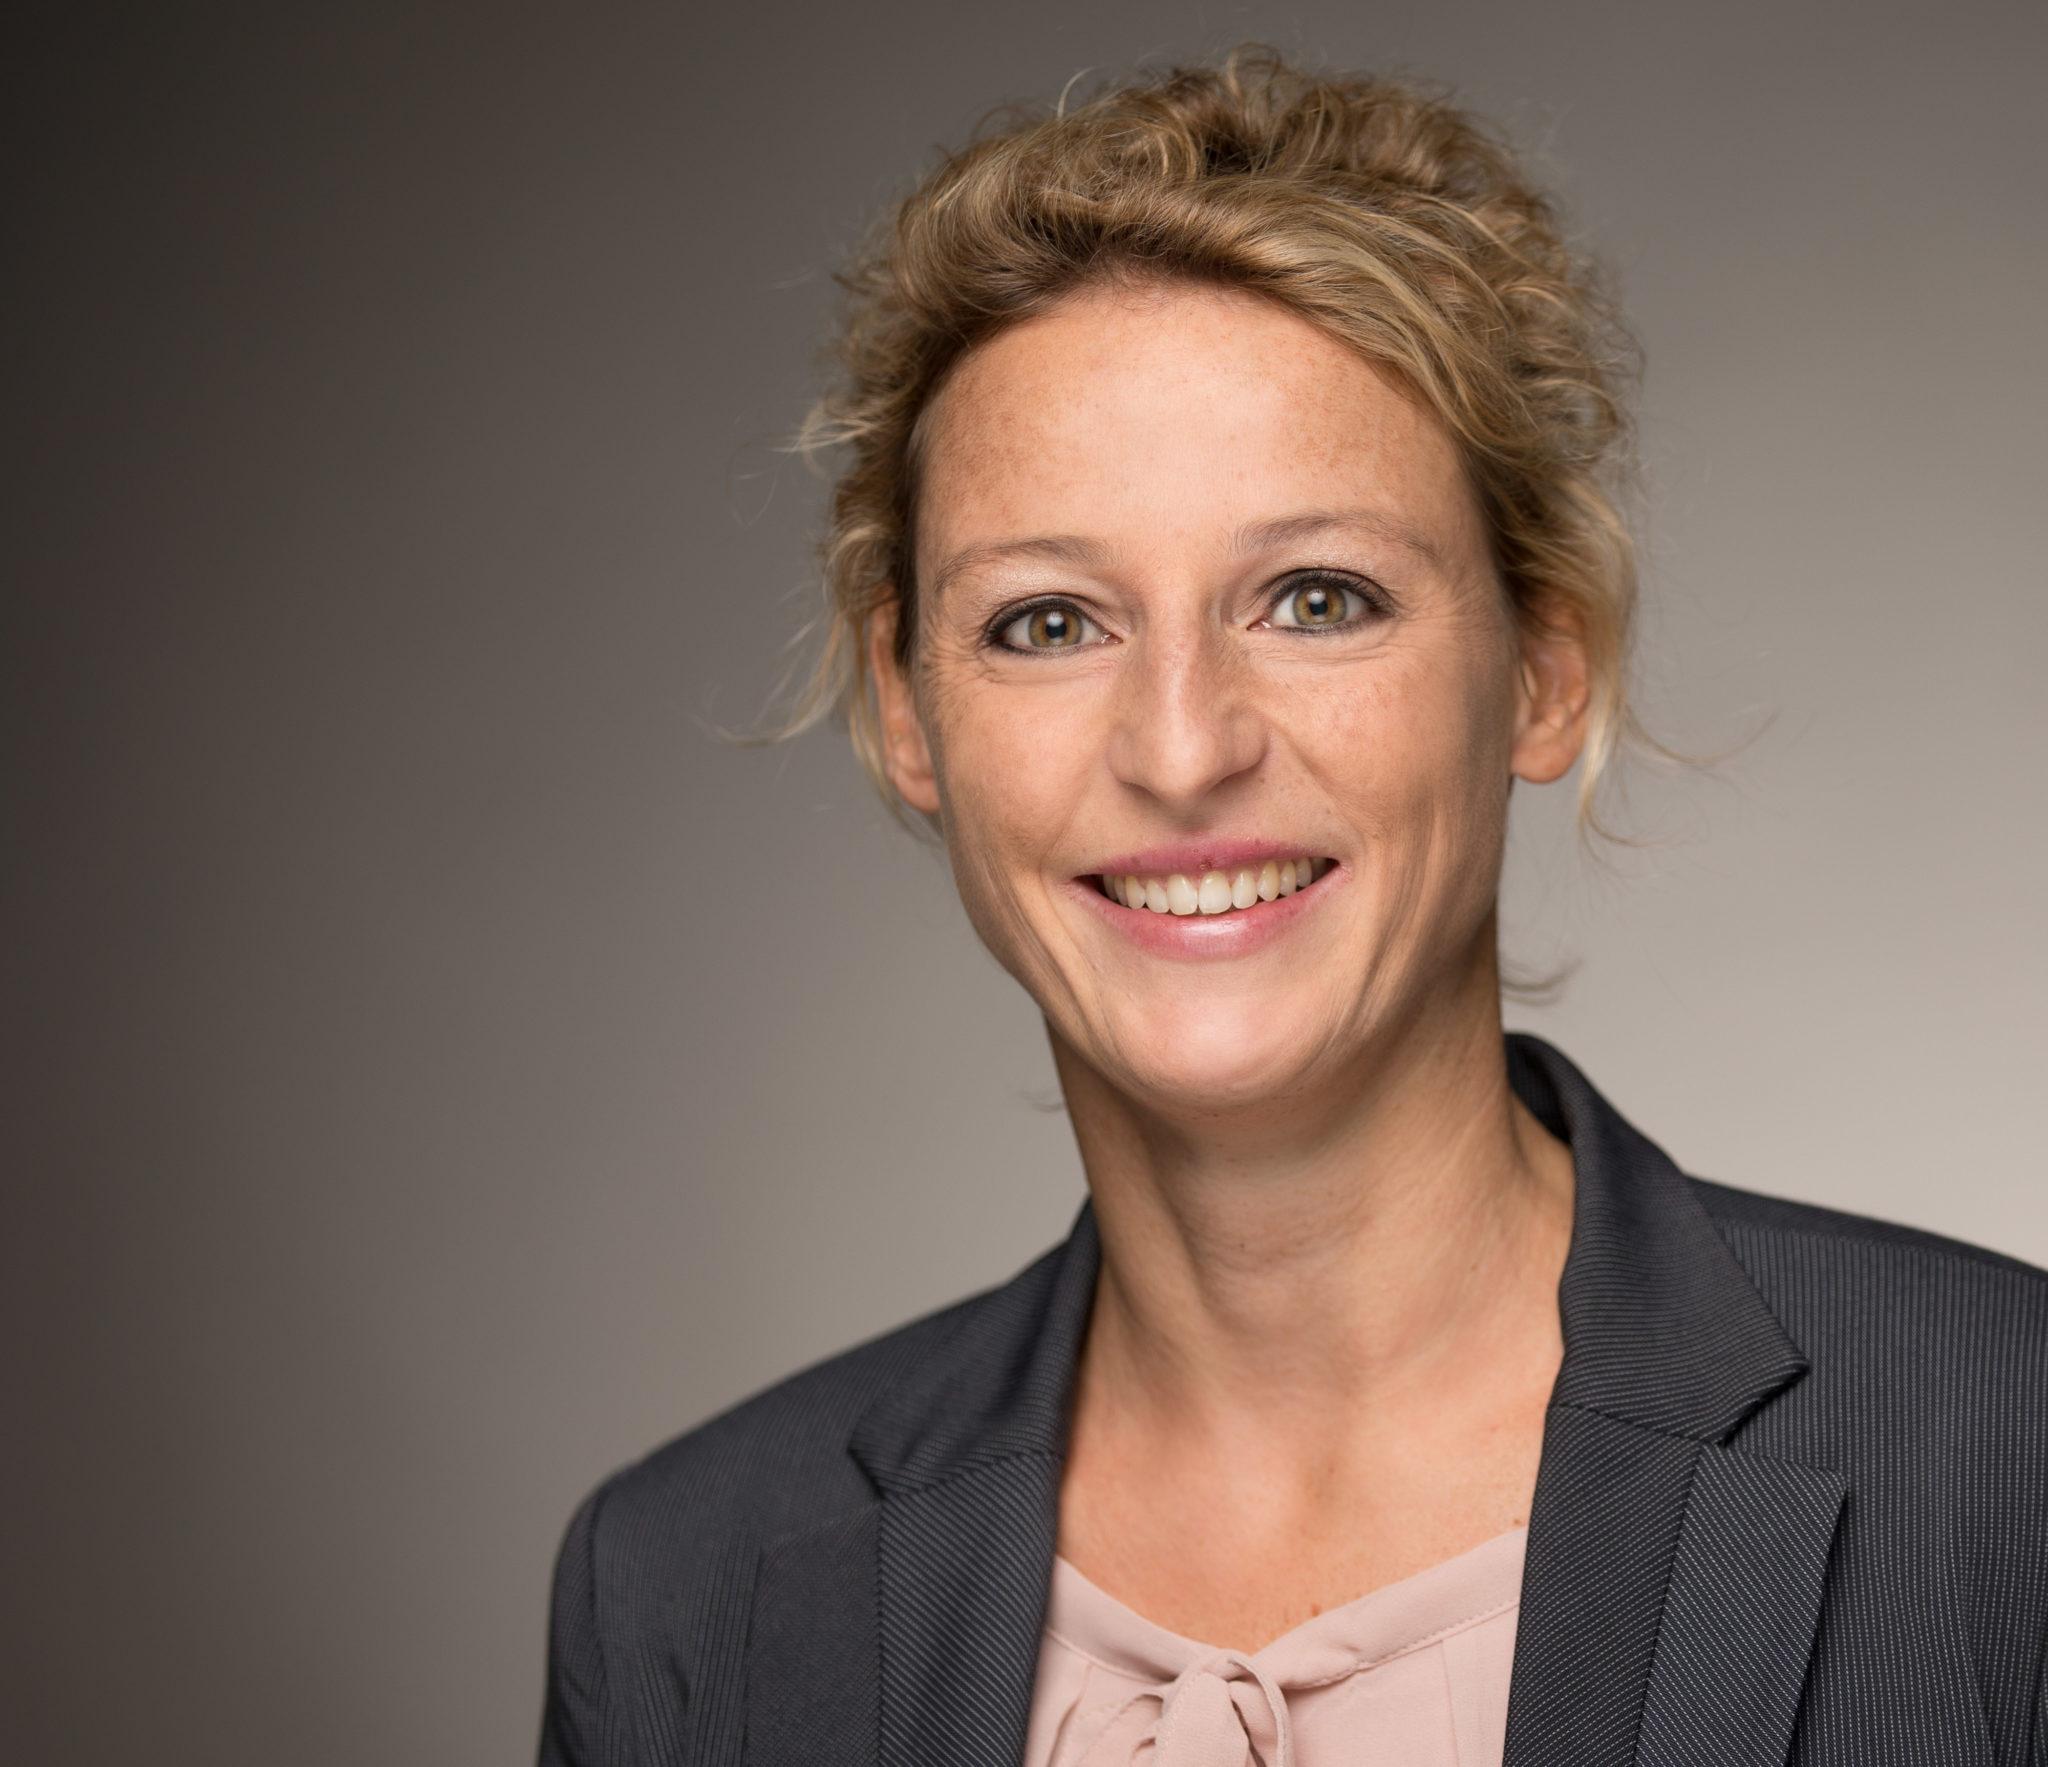 Simone Lösch